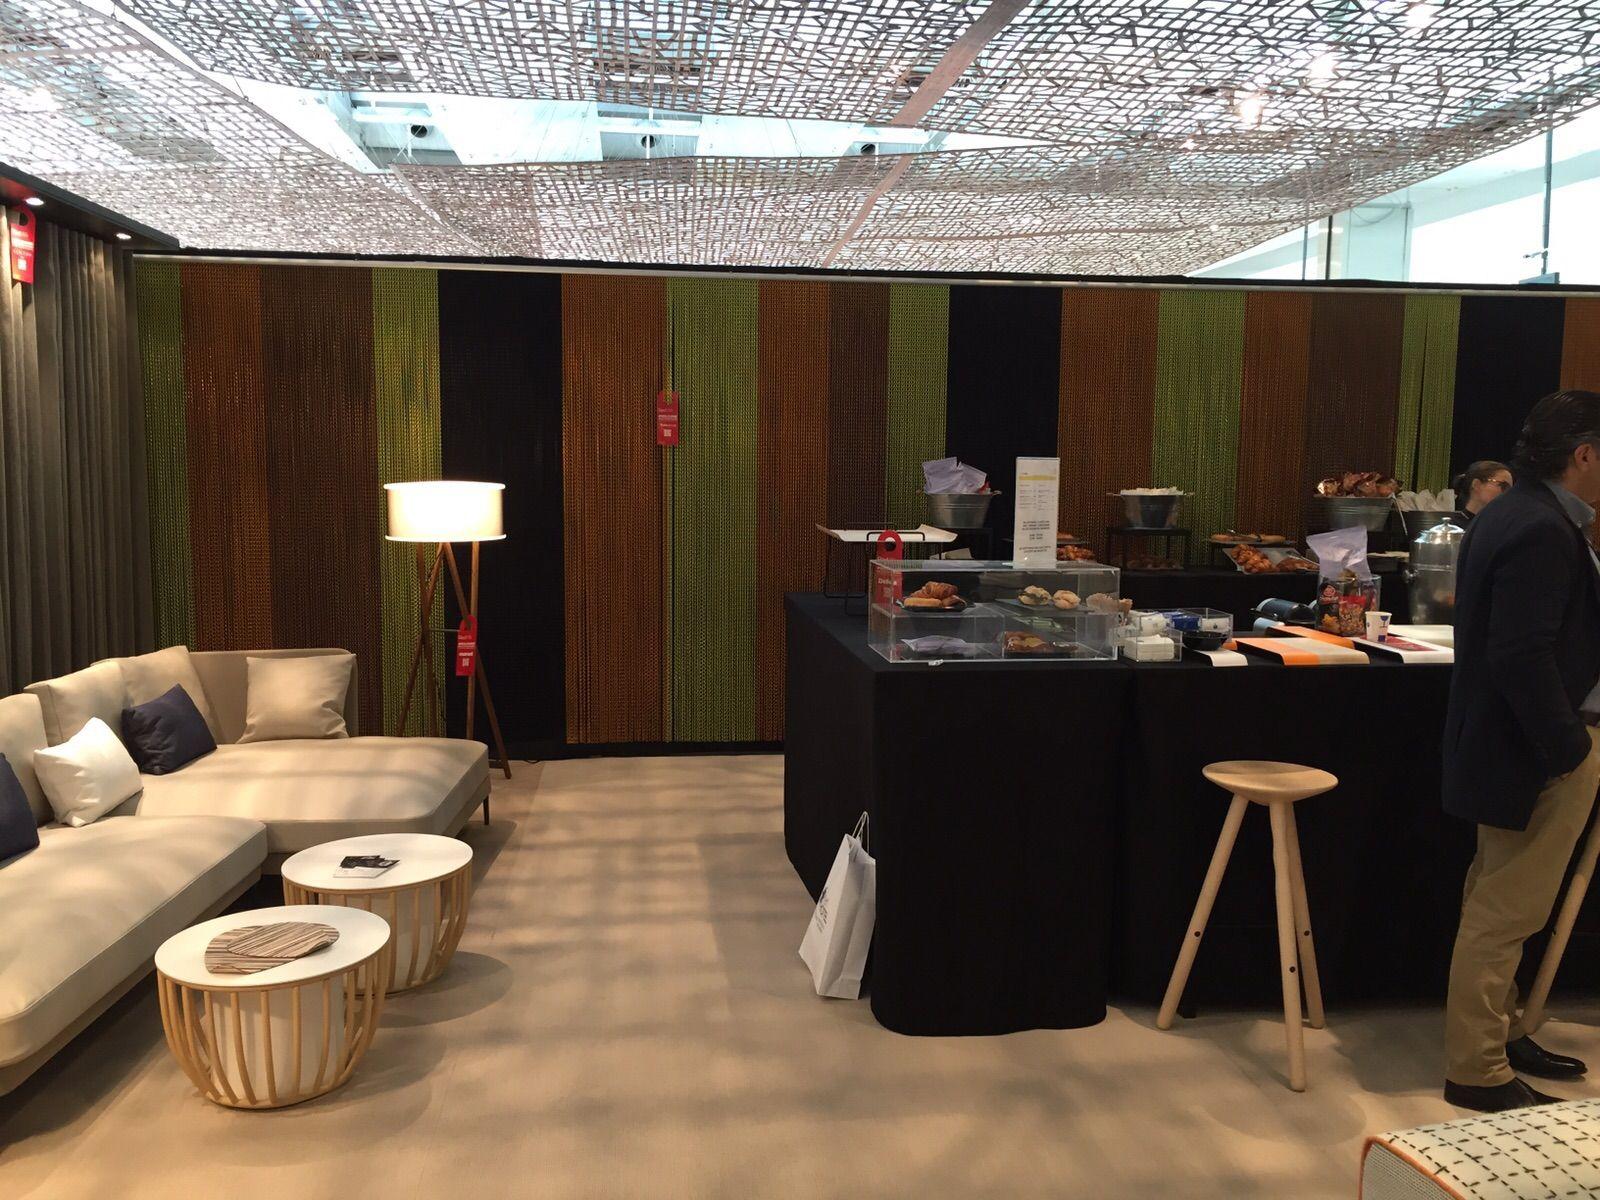 Lounge Area At Interihotel2015 Equipped By Kriskadecor Curtains  # Muebles Gamma San Juan